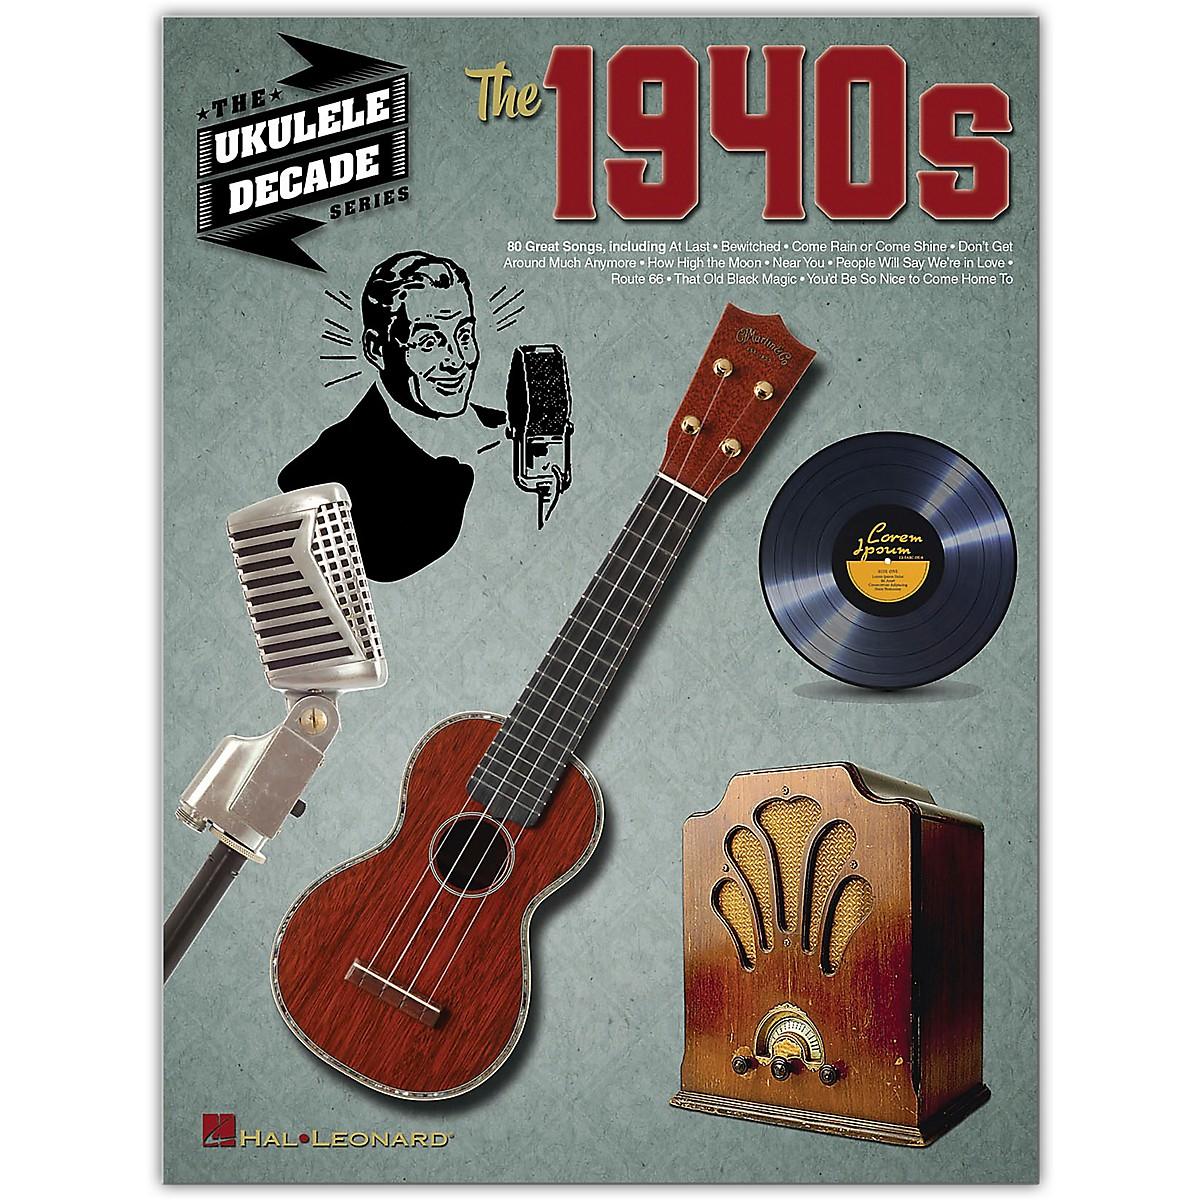 Hal Leonard The 1940s (The Ukulele Decade Series) Ukulele Songbook